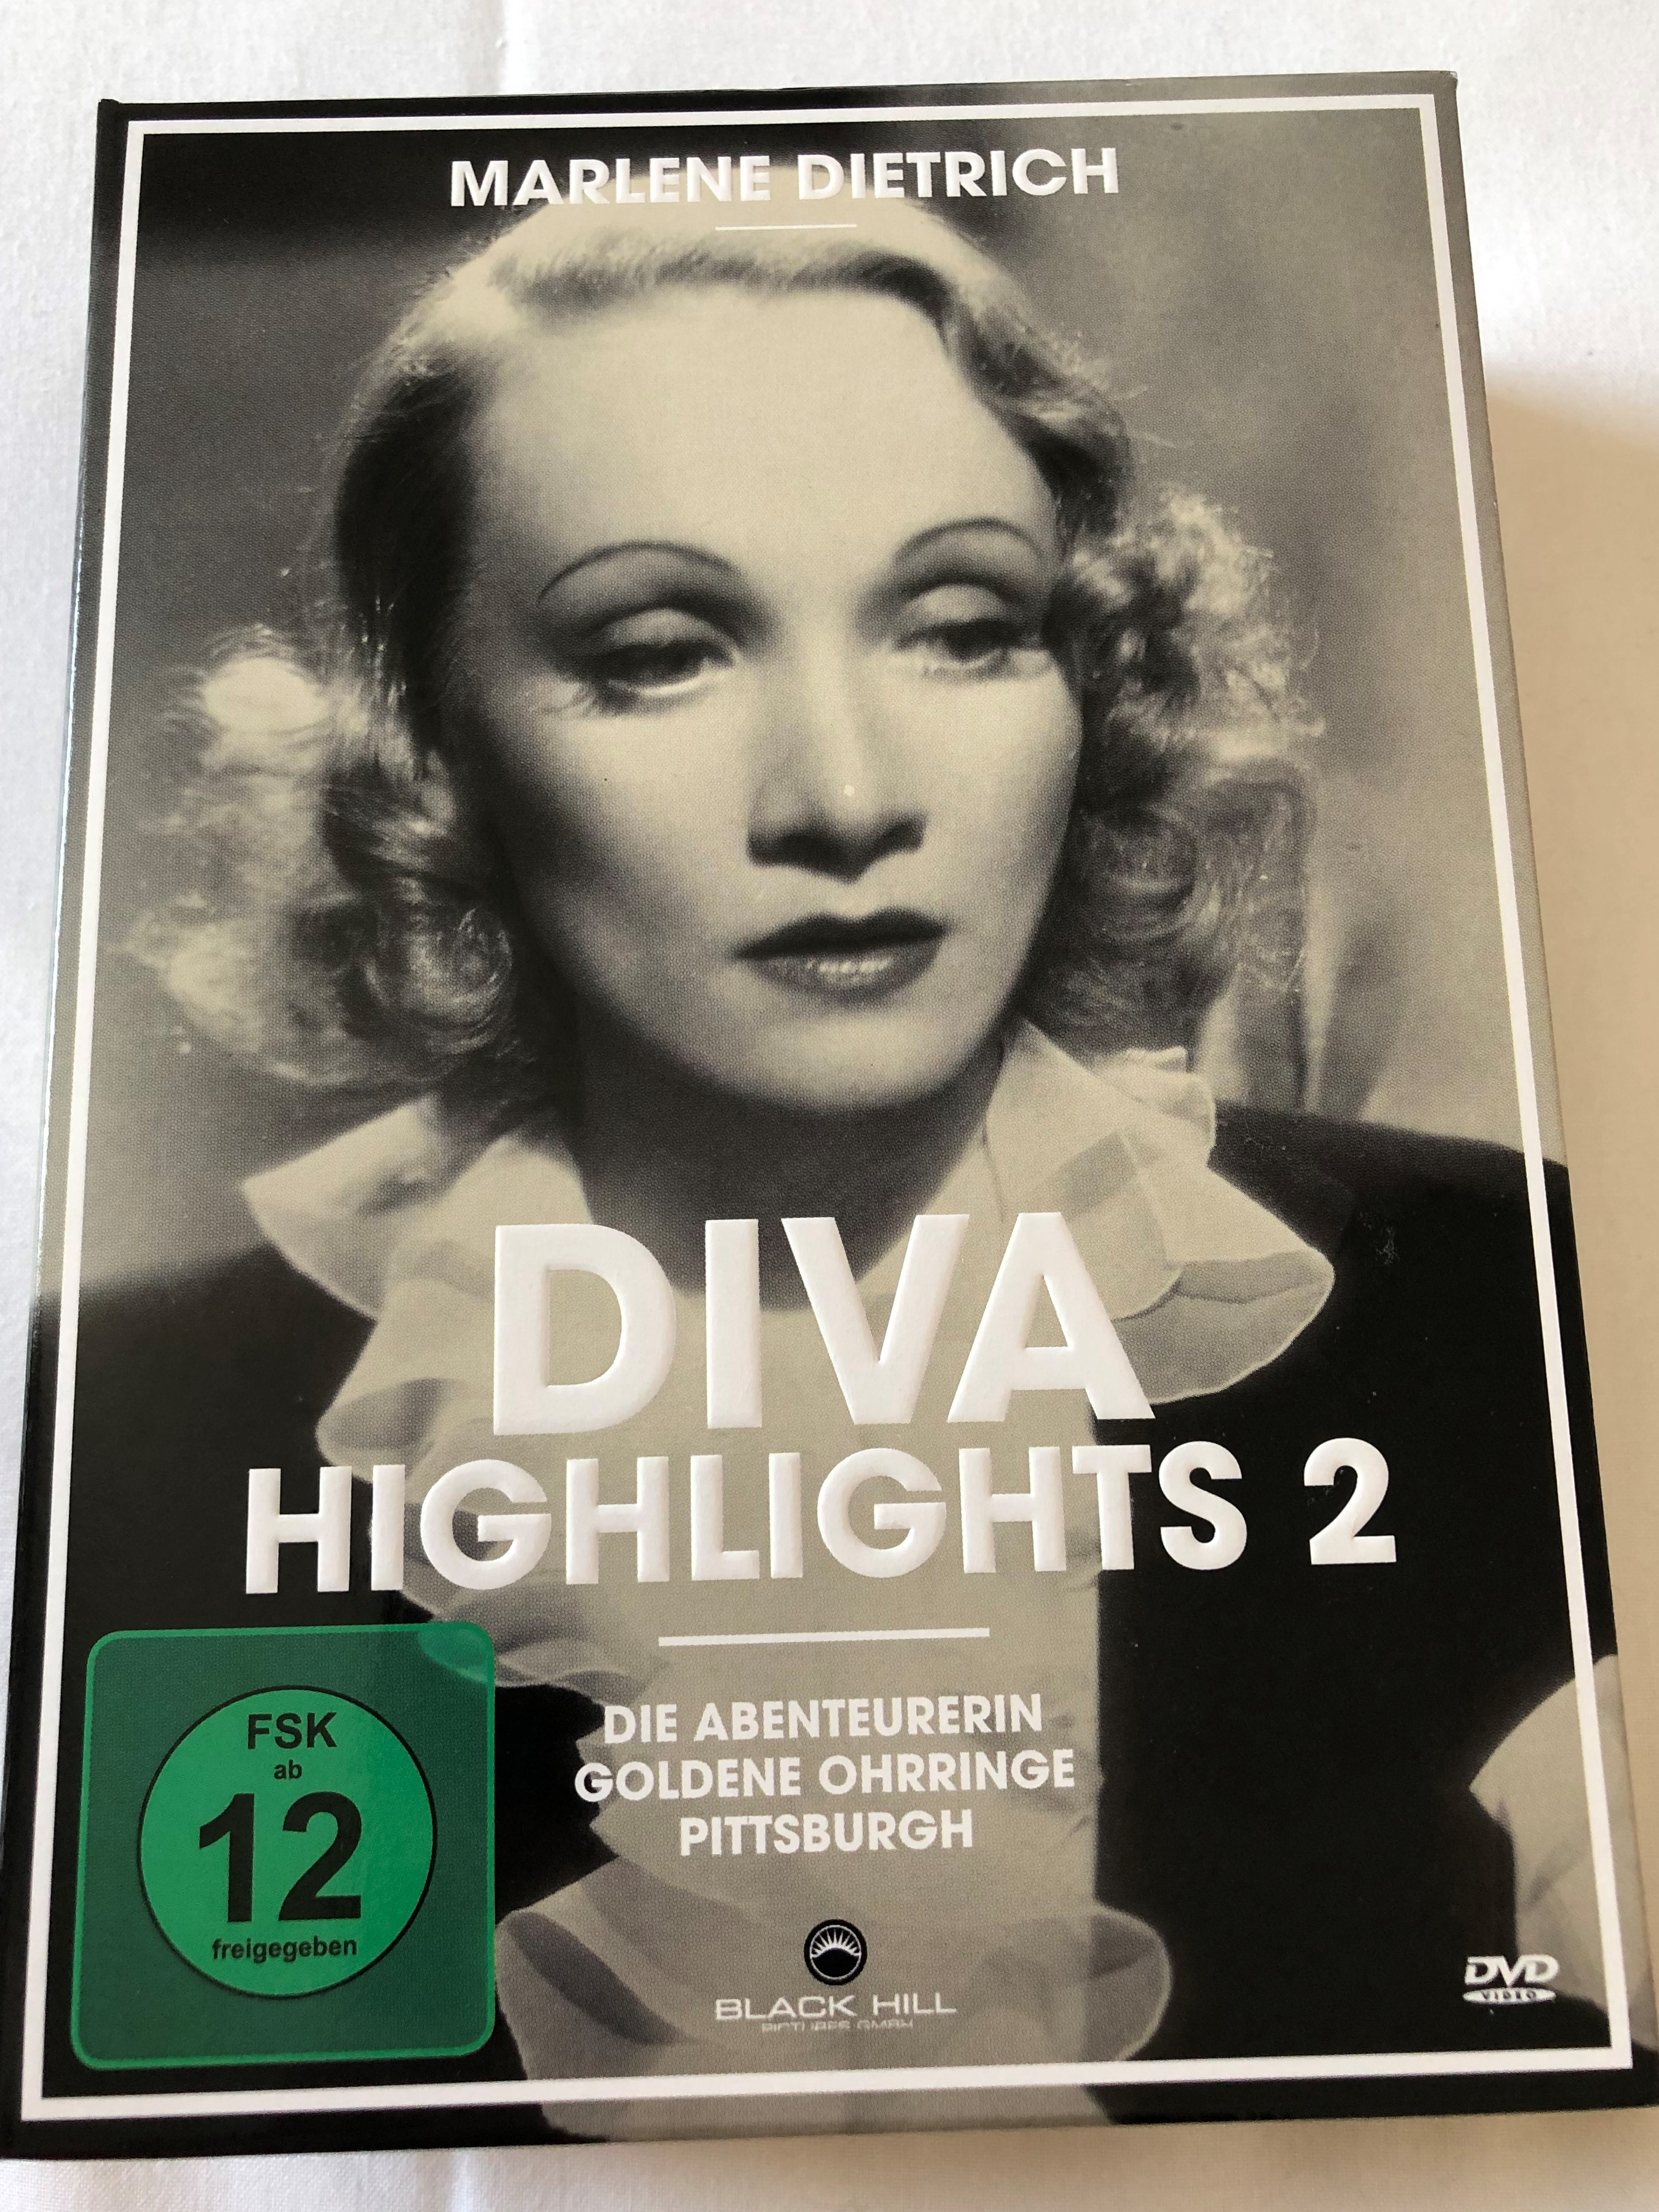 marlene-dietrich-diva-highlights-2-dvd-set-3-highlights-black-white-classics-with-marlene-dietrich-the-film-diva-the-flame-of-new-orleans-golden-earring-pittsburgh-digital-remastered-3-discs-1-.jpg